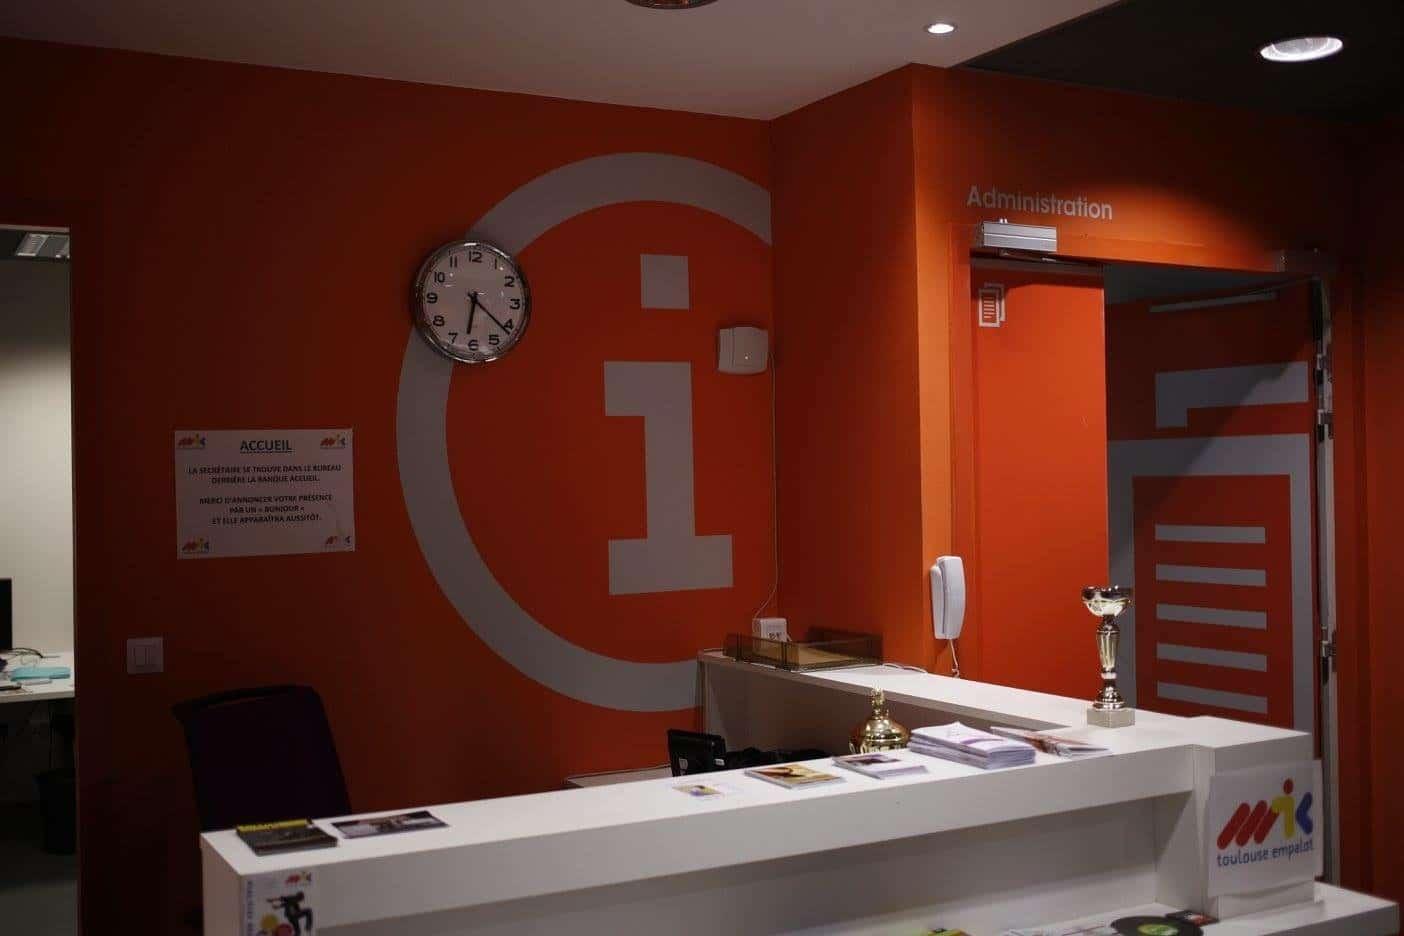 Enseigne Led enseigne lumineuse Toulouse - Signalétique - Impression grand format - adhésif - marquage vitrine